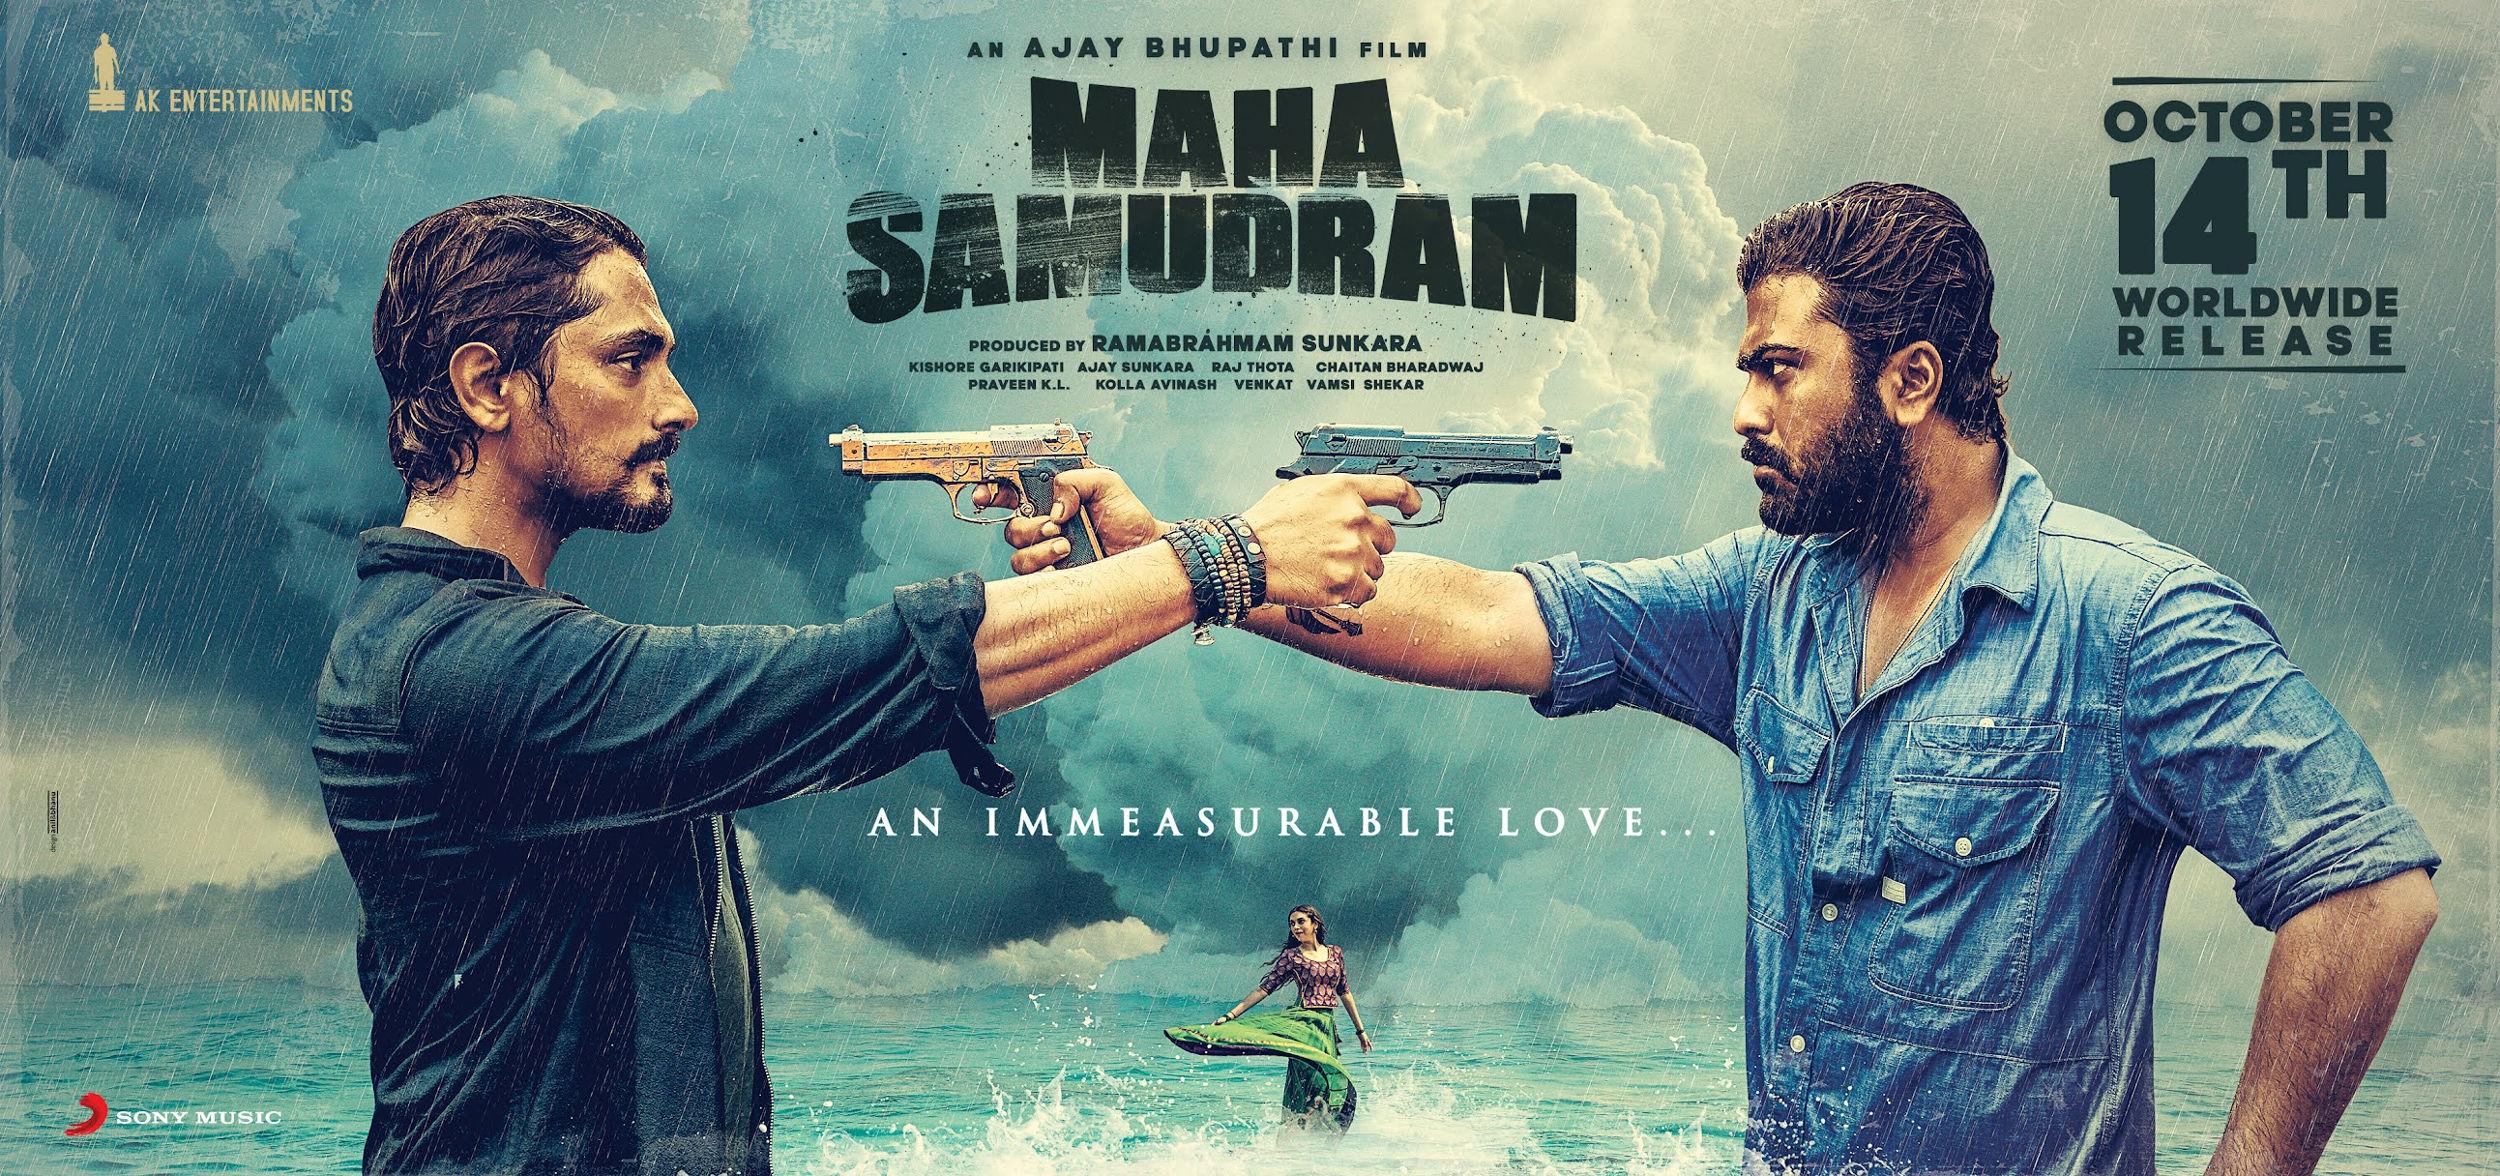 Sharwanand Siddharth Maha Samudram Releasing On October 14